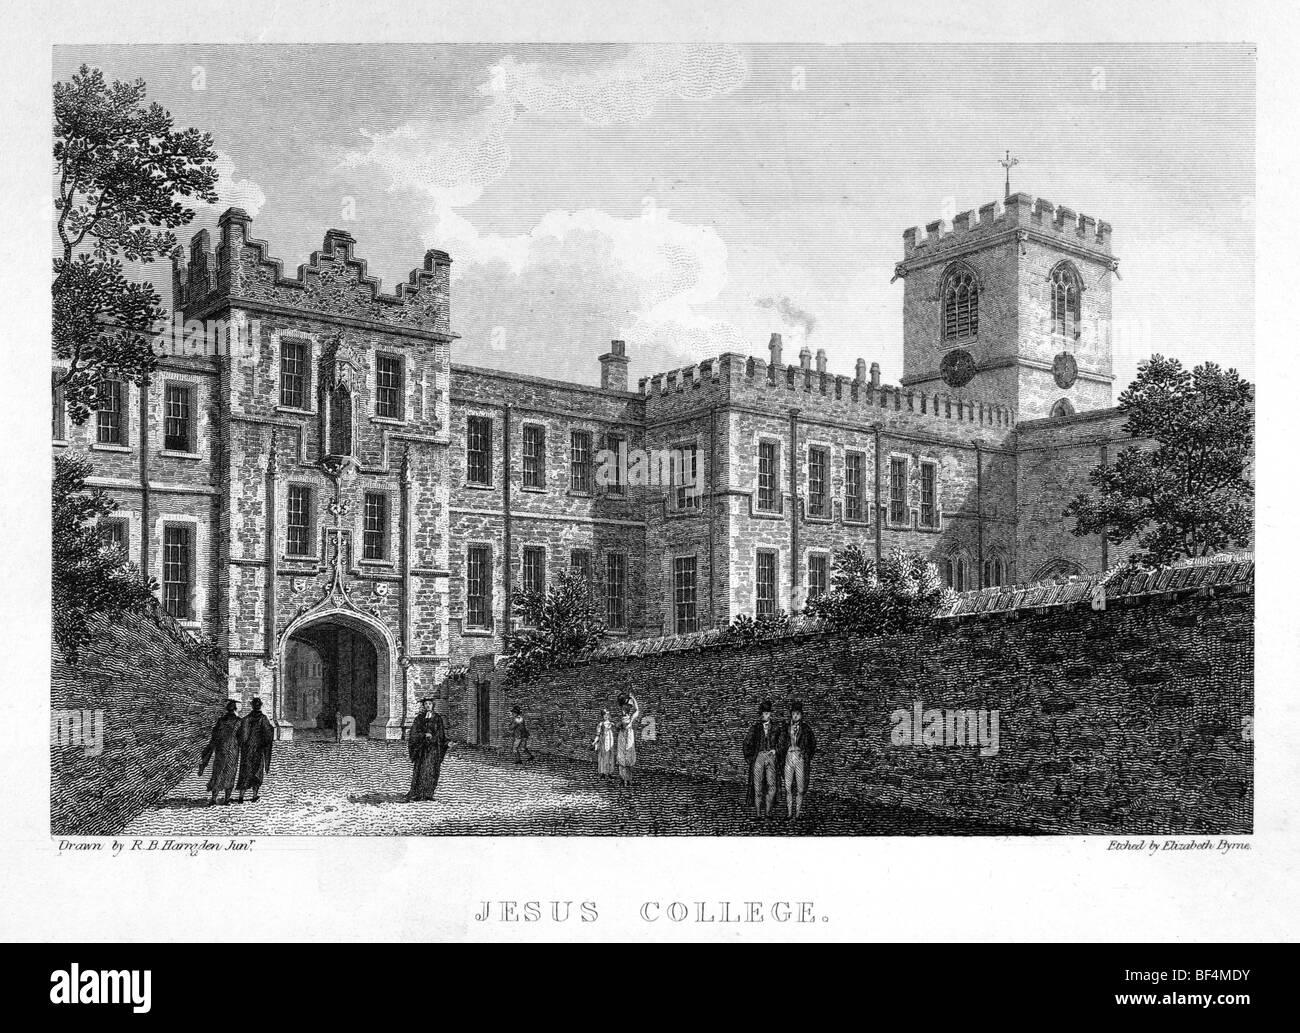 Jesus College, Cambridge - Stock Image